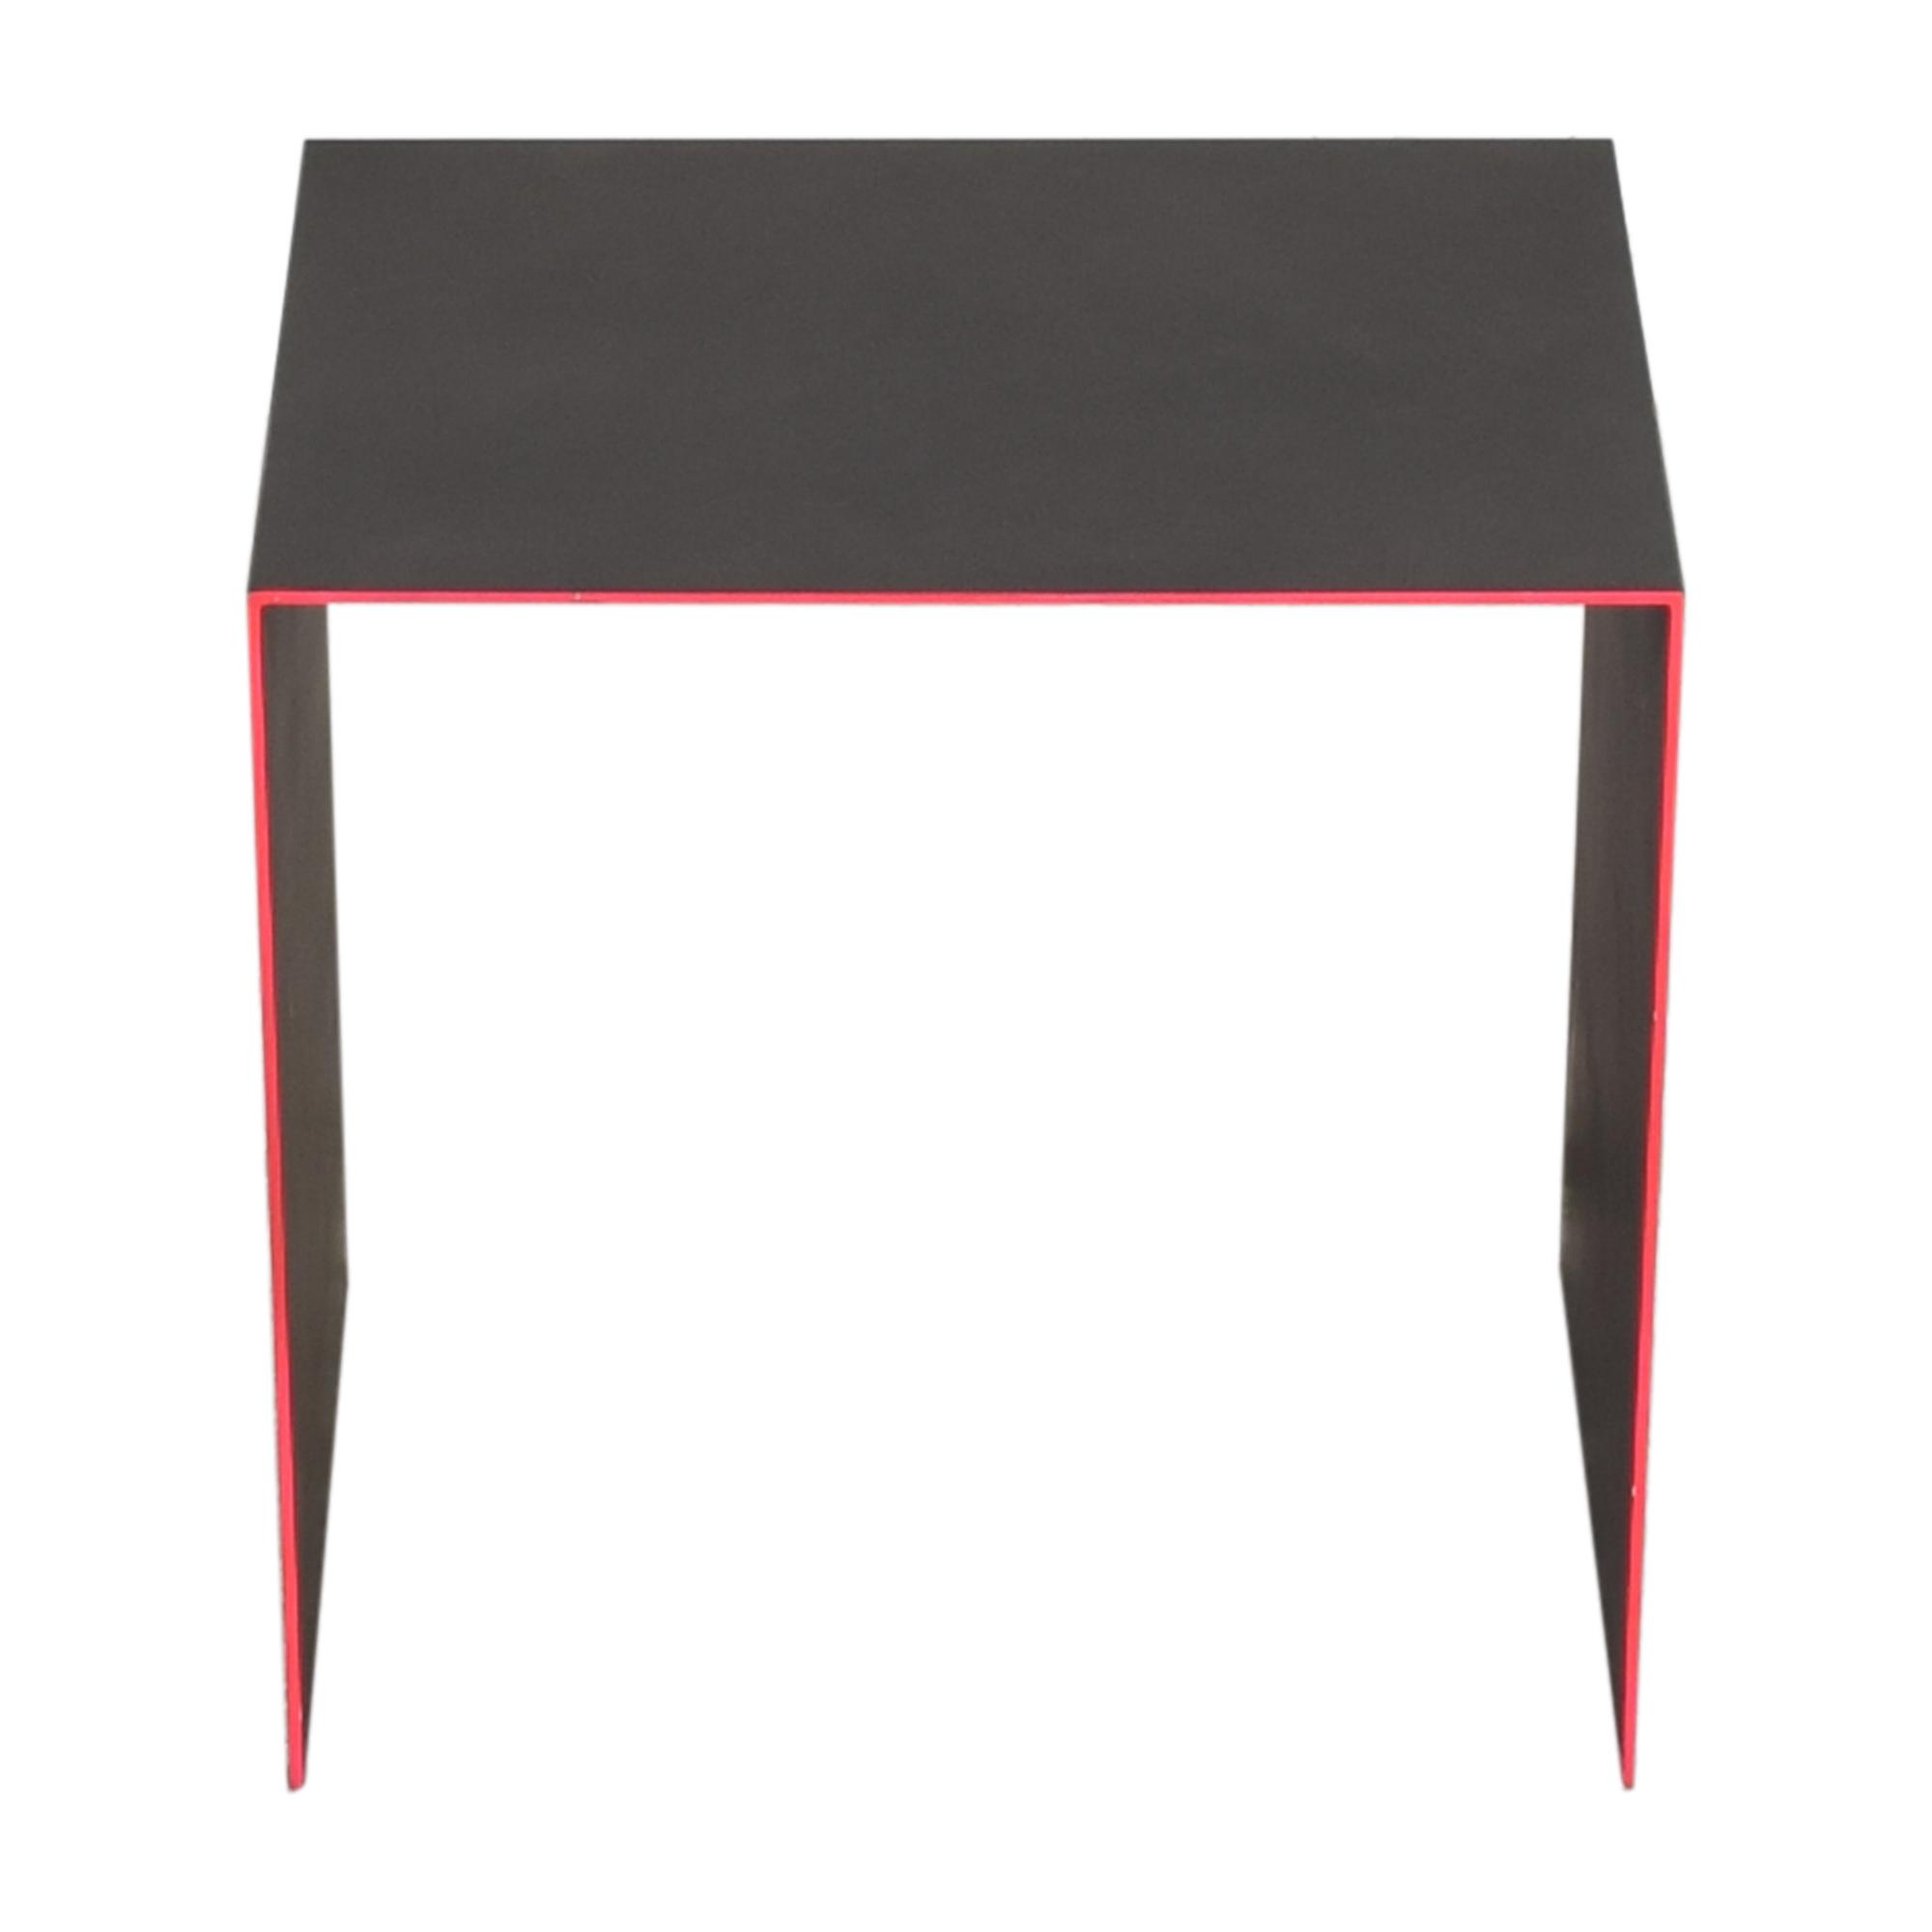 ABC Carpet & Home ABC Carpet & Home abcDNA Fluid Steel End Table dark grey